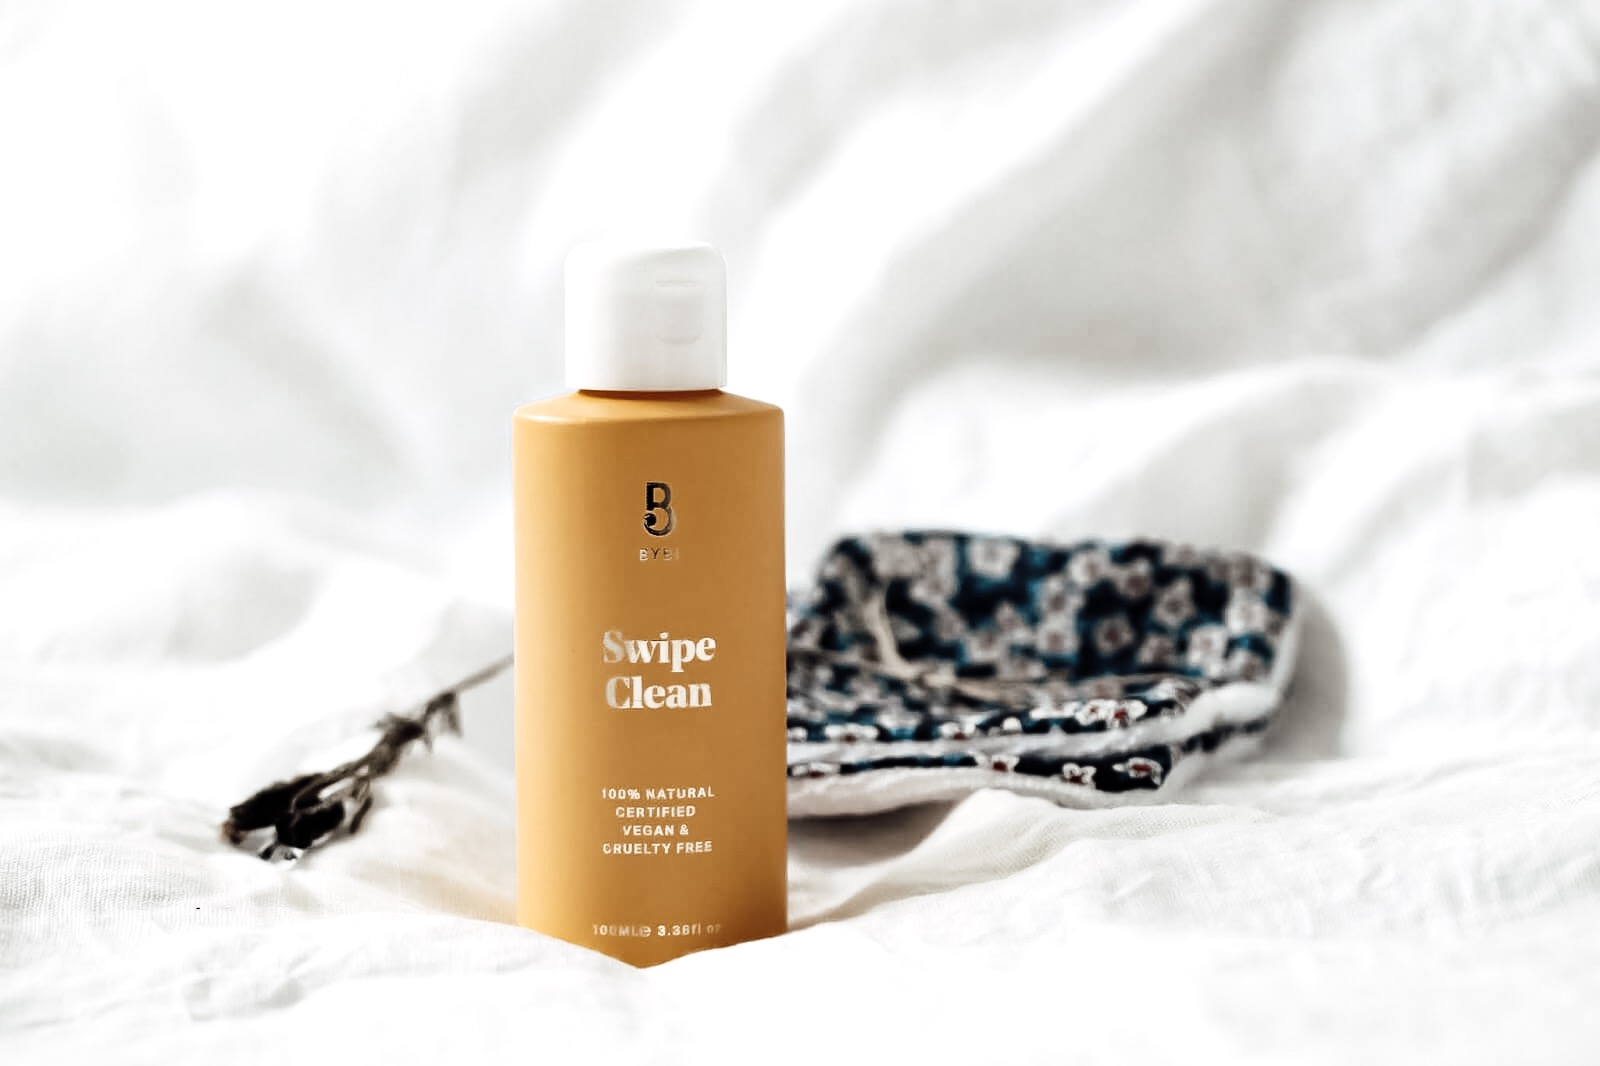 bybi-swipe-clean-huile-demaquillante-composition-formule-liste-inci-avis-test